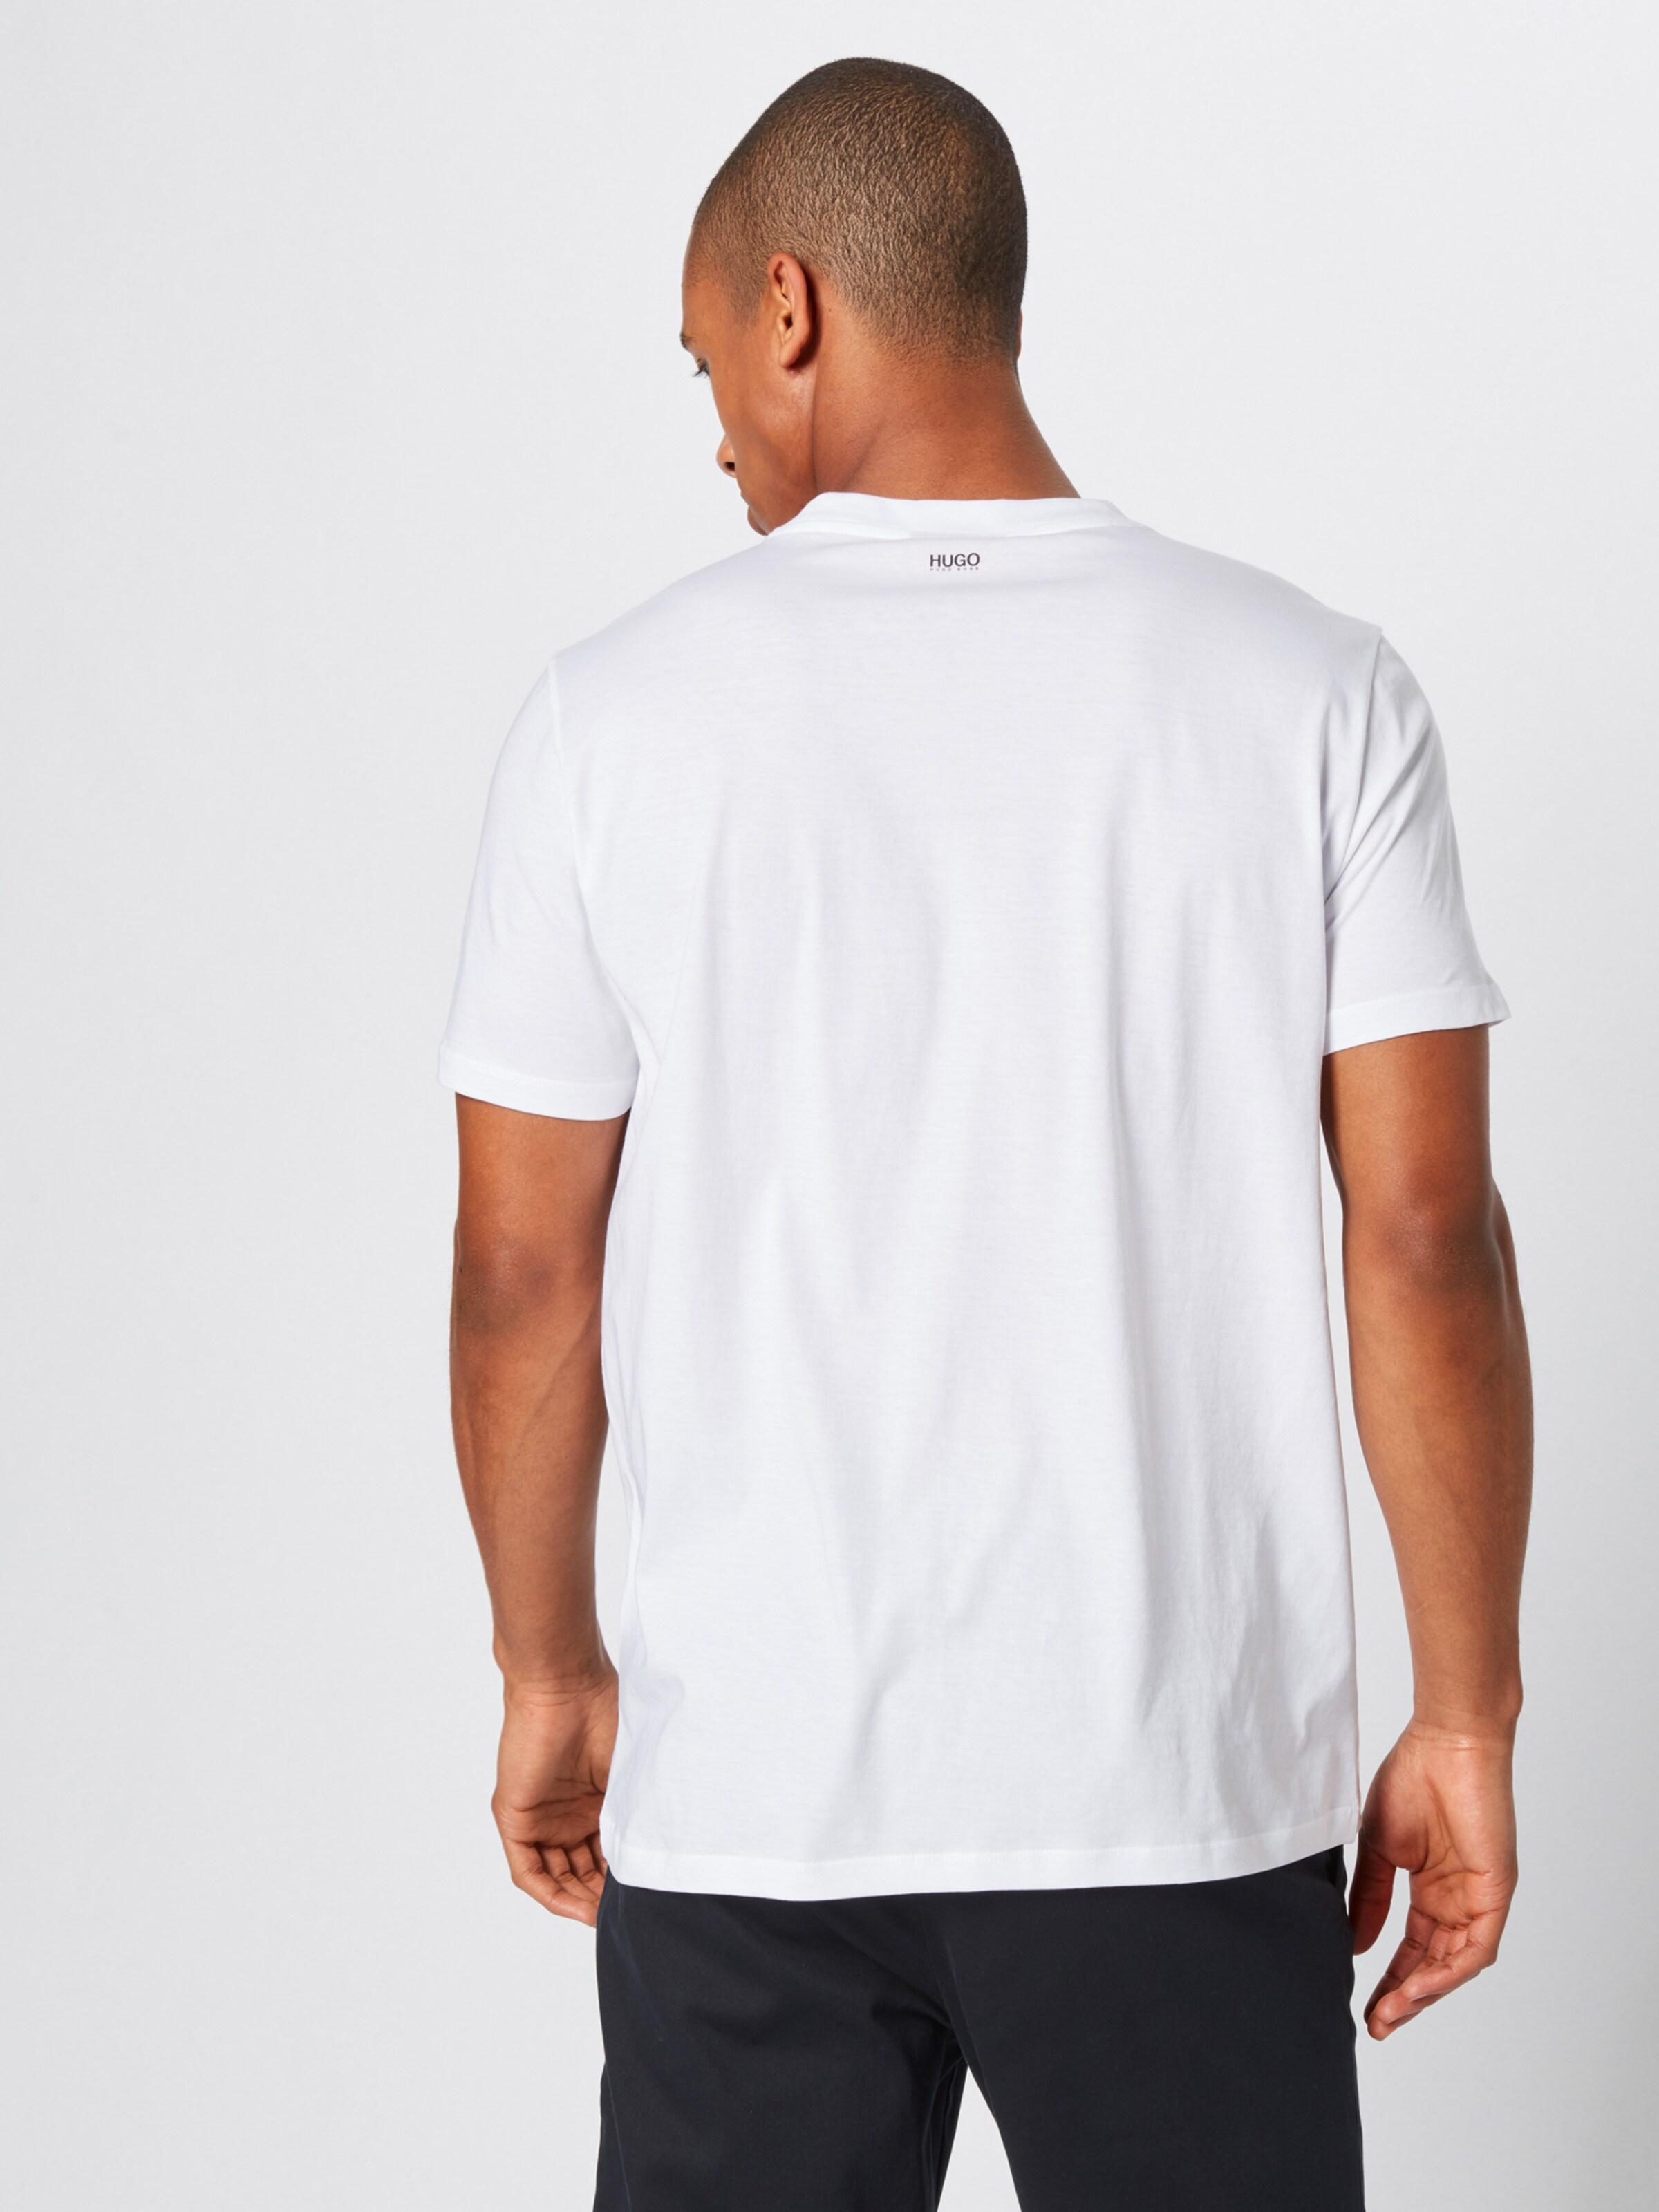 FoncéBlanc T En shirt 01' Hugo Gris 10191057 'dadaist PNZ0OX8wnk